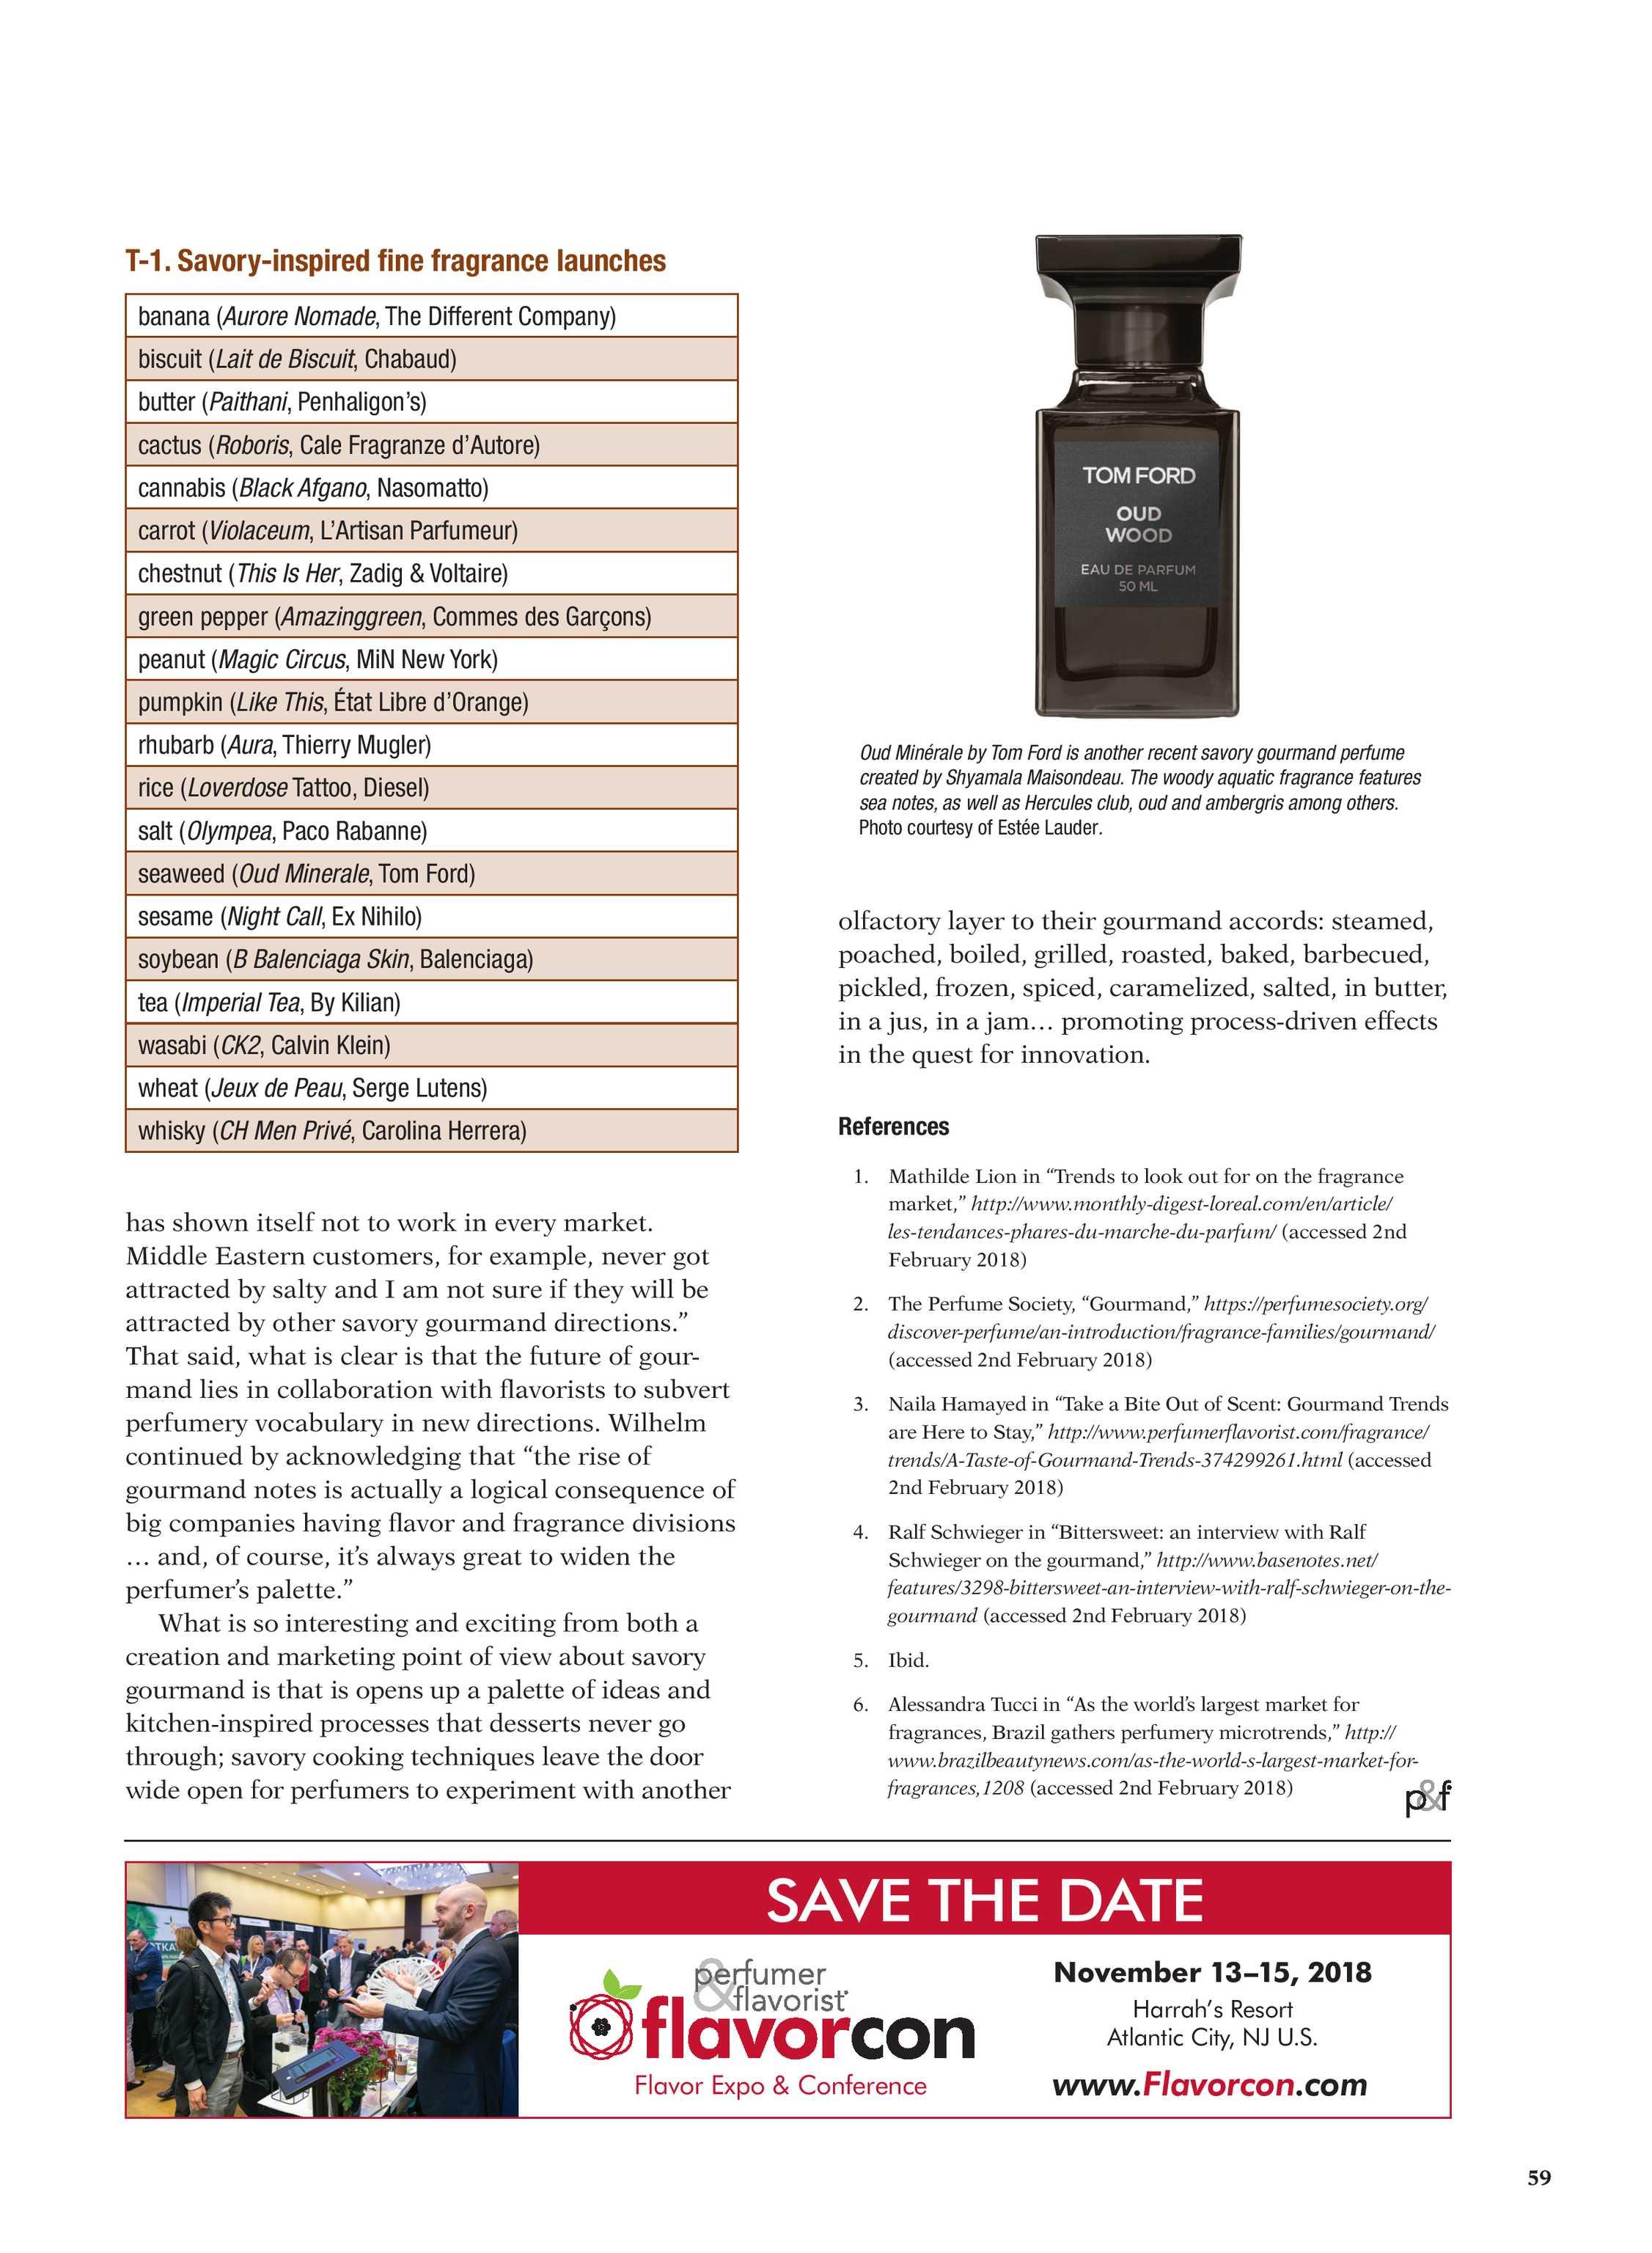 Perfumer & Flavorist - May 2018 - page 60